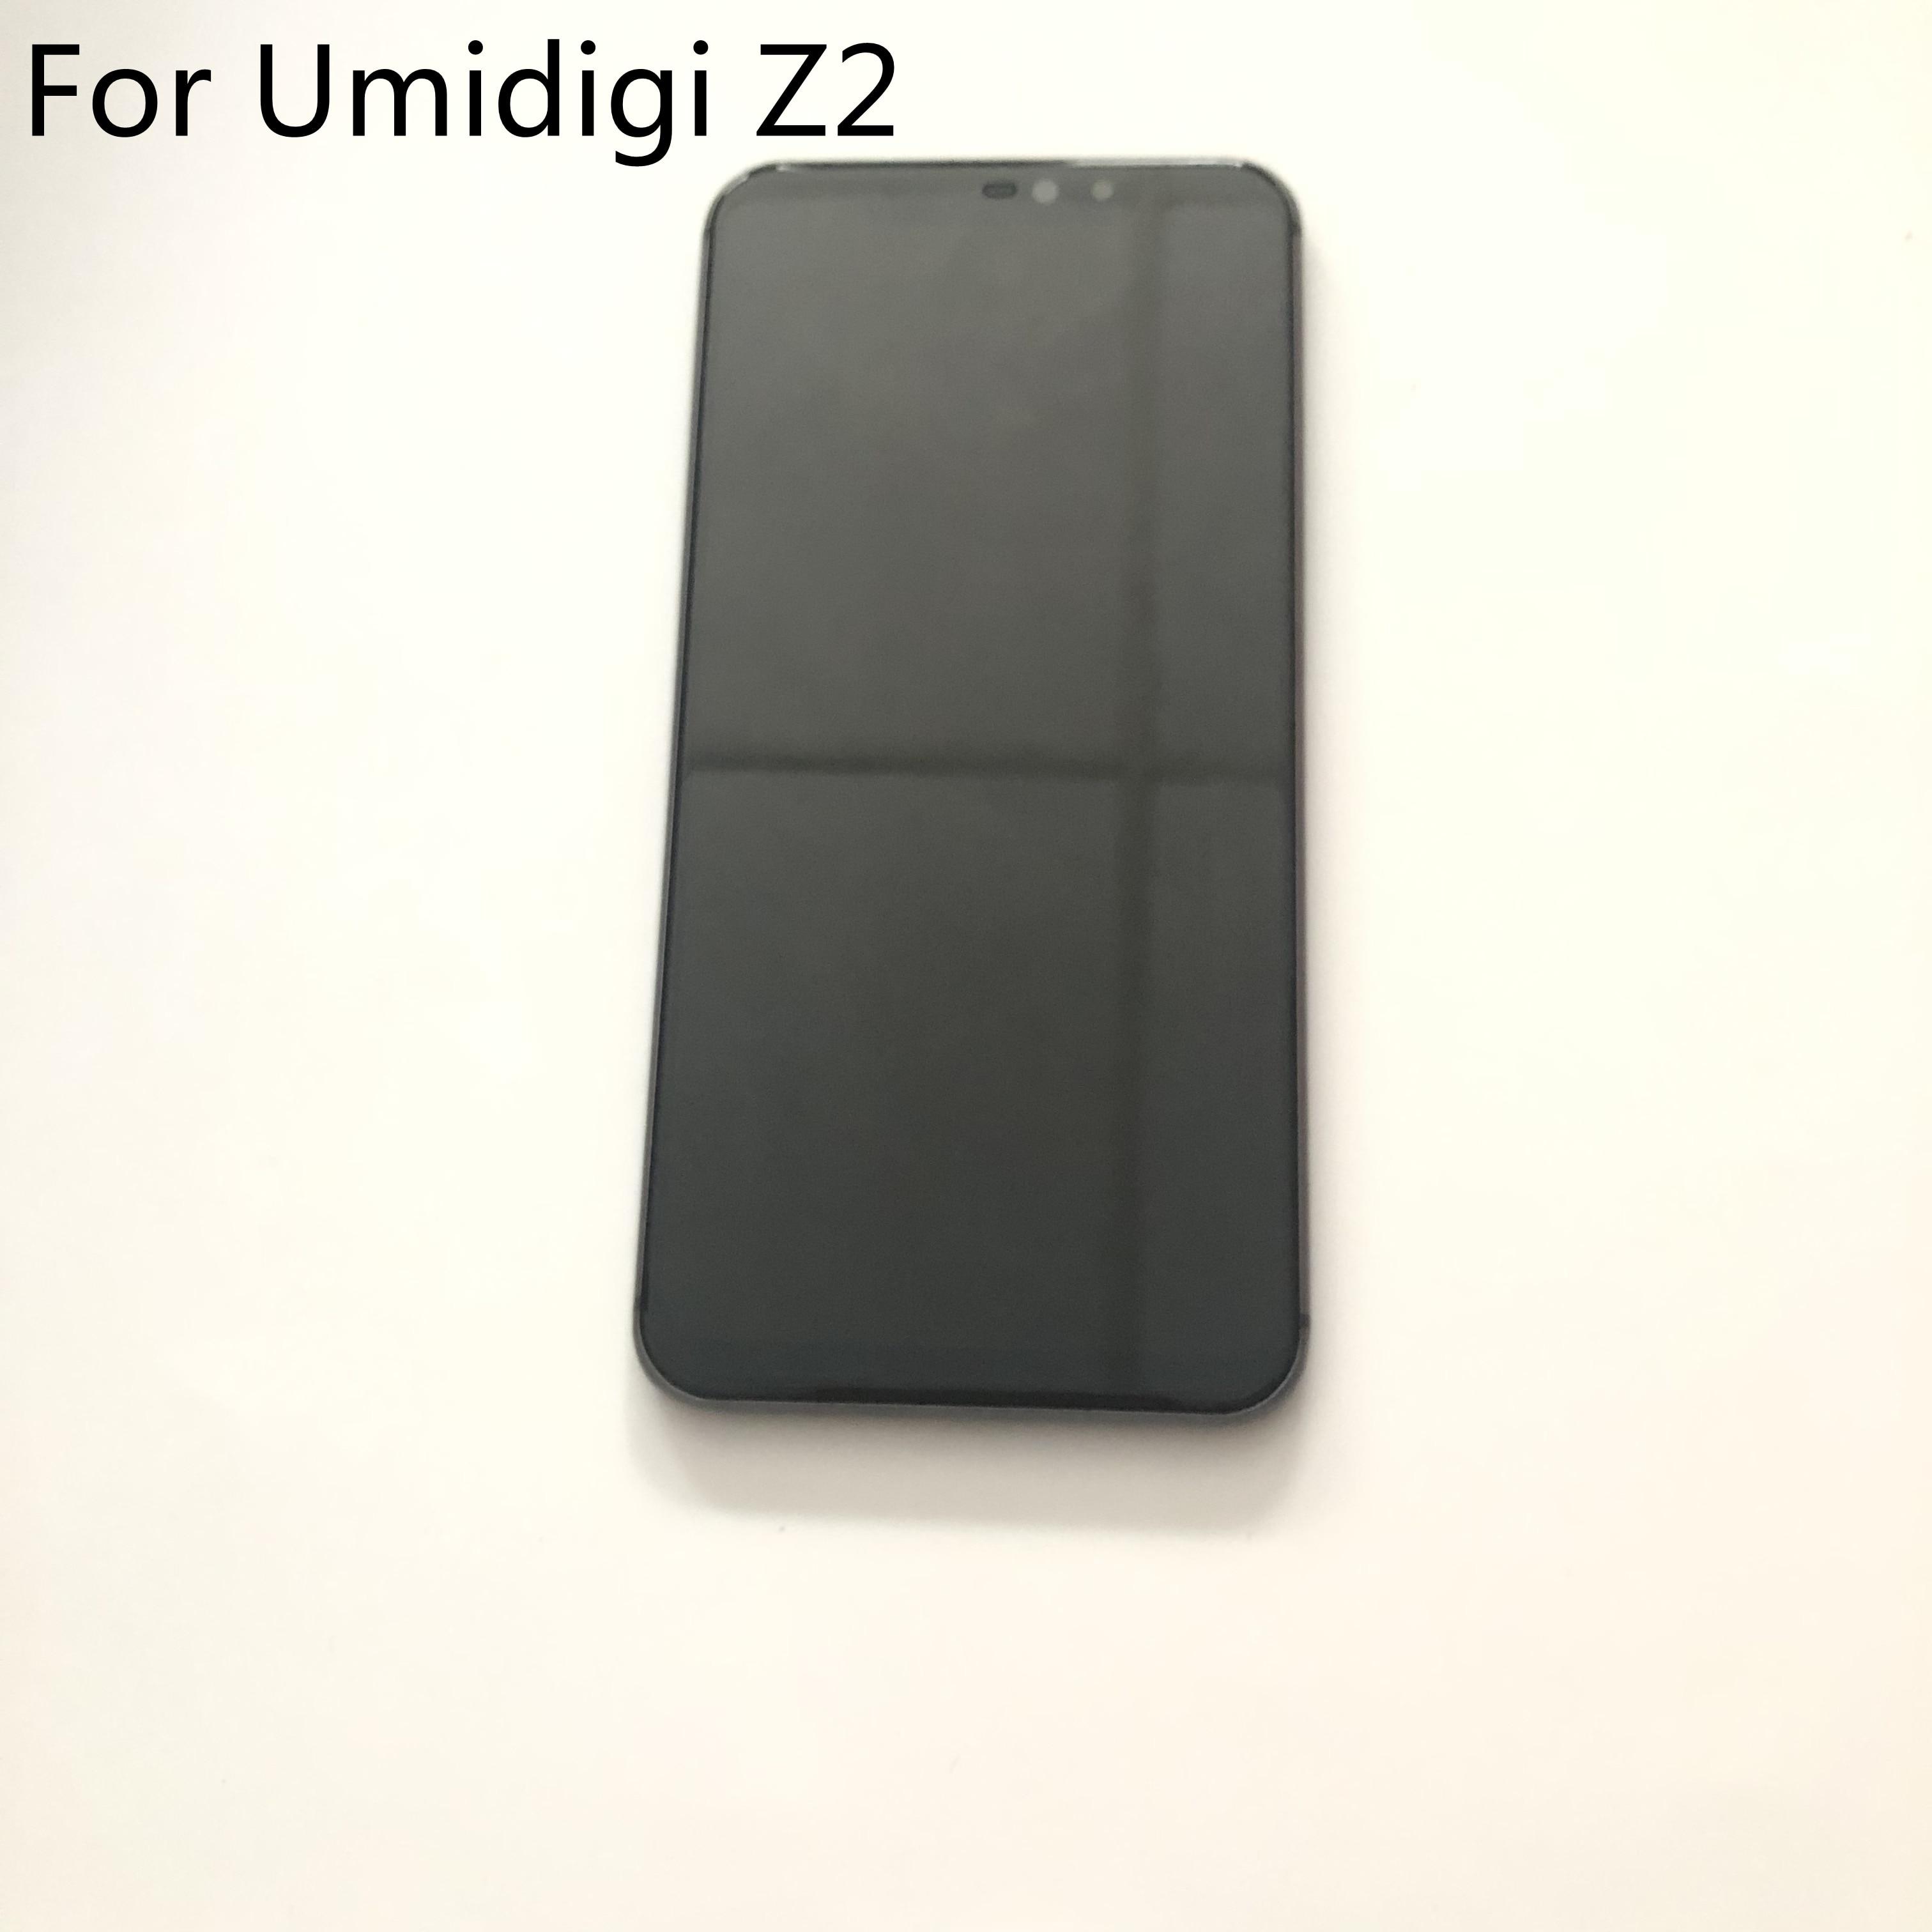 "Pantalla LCD Umidigi Z2 usada + pantalla táctil + marco para Umidigi Z2 MTK6763 Octa Core 6,2 ""2246x1080 envío gratis"